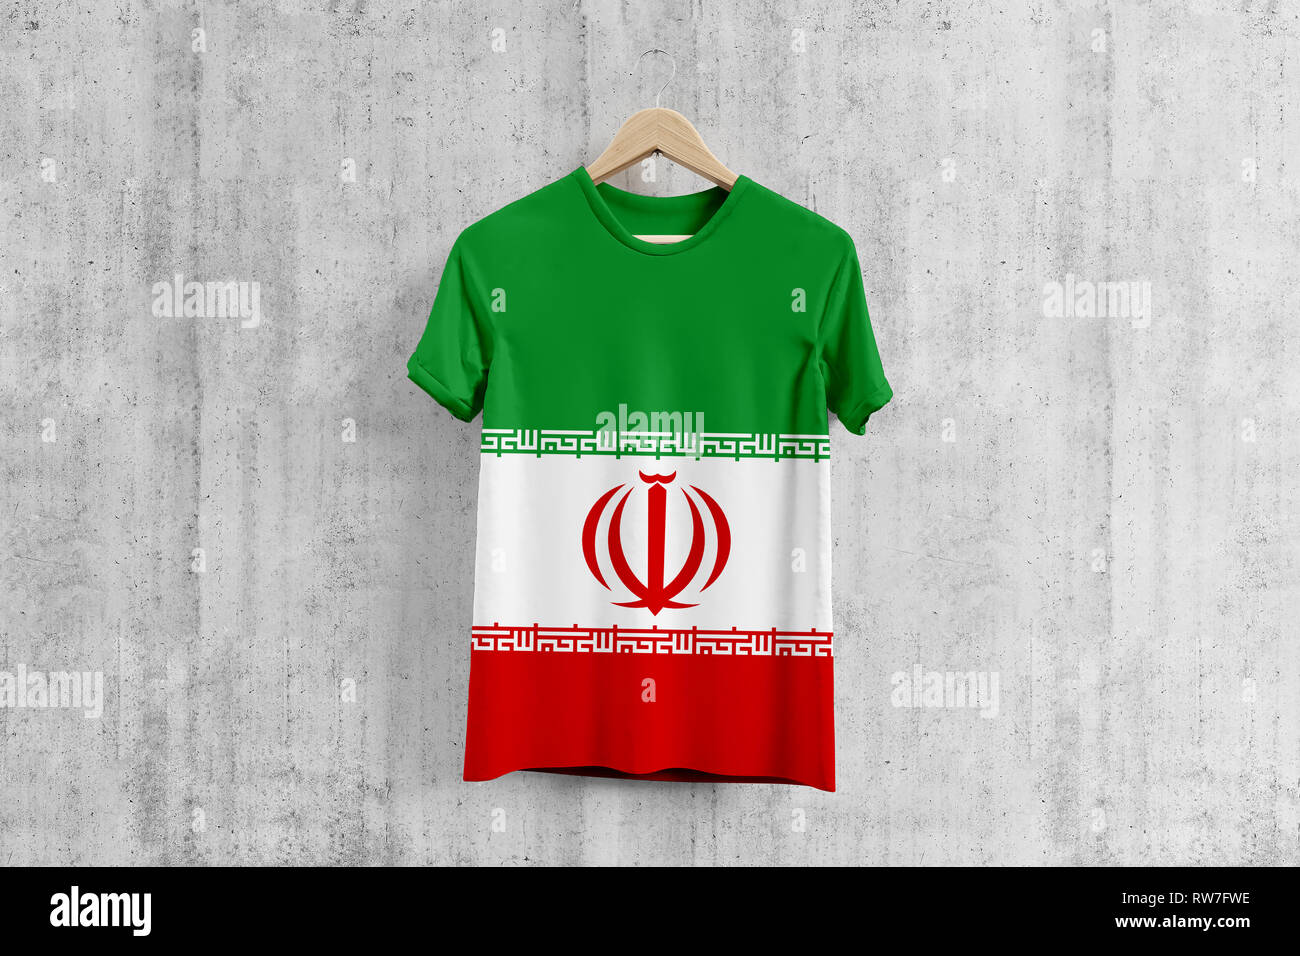 competitive price b8913 6efde Iran flag T-shirt on hanger, Iranian team uniform design ...